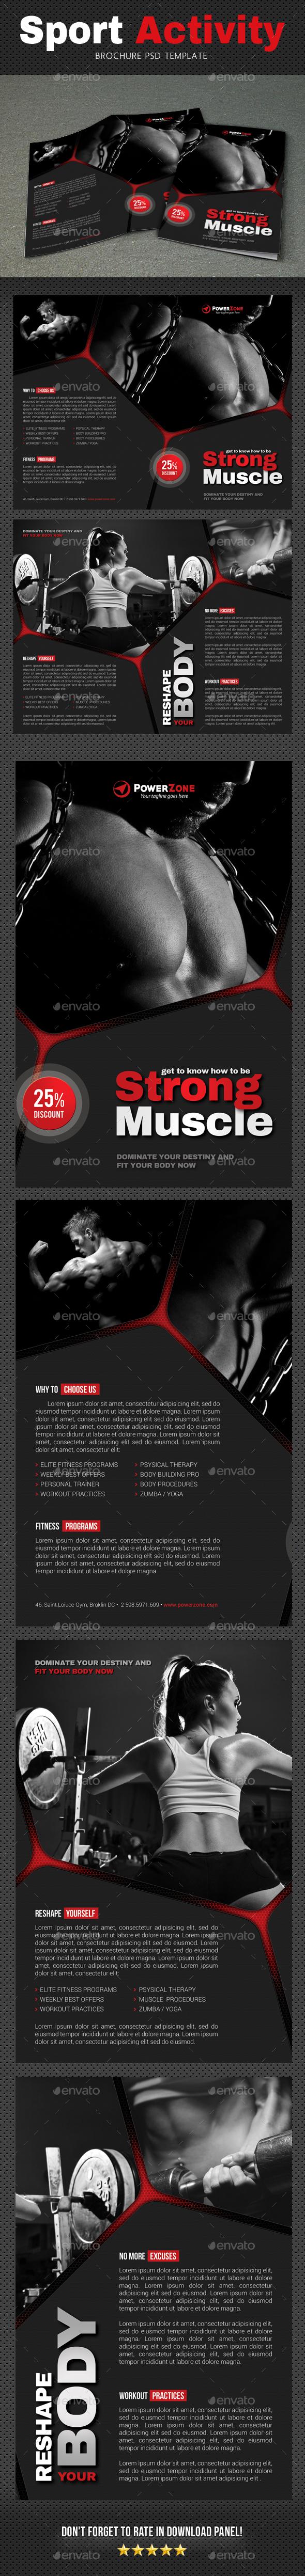 Sport Activity Brochure 5 - Brochures Print Templates